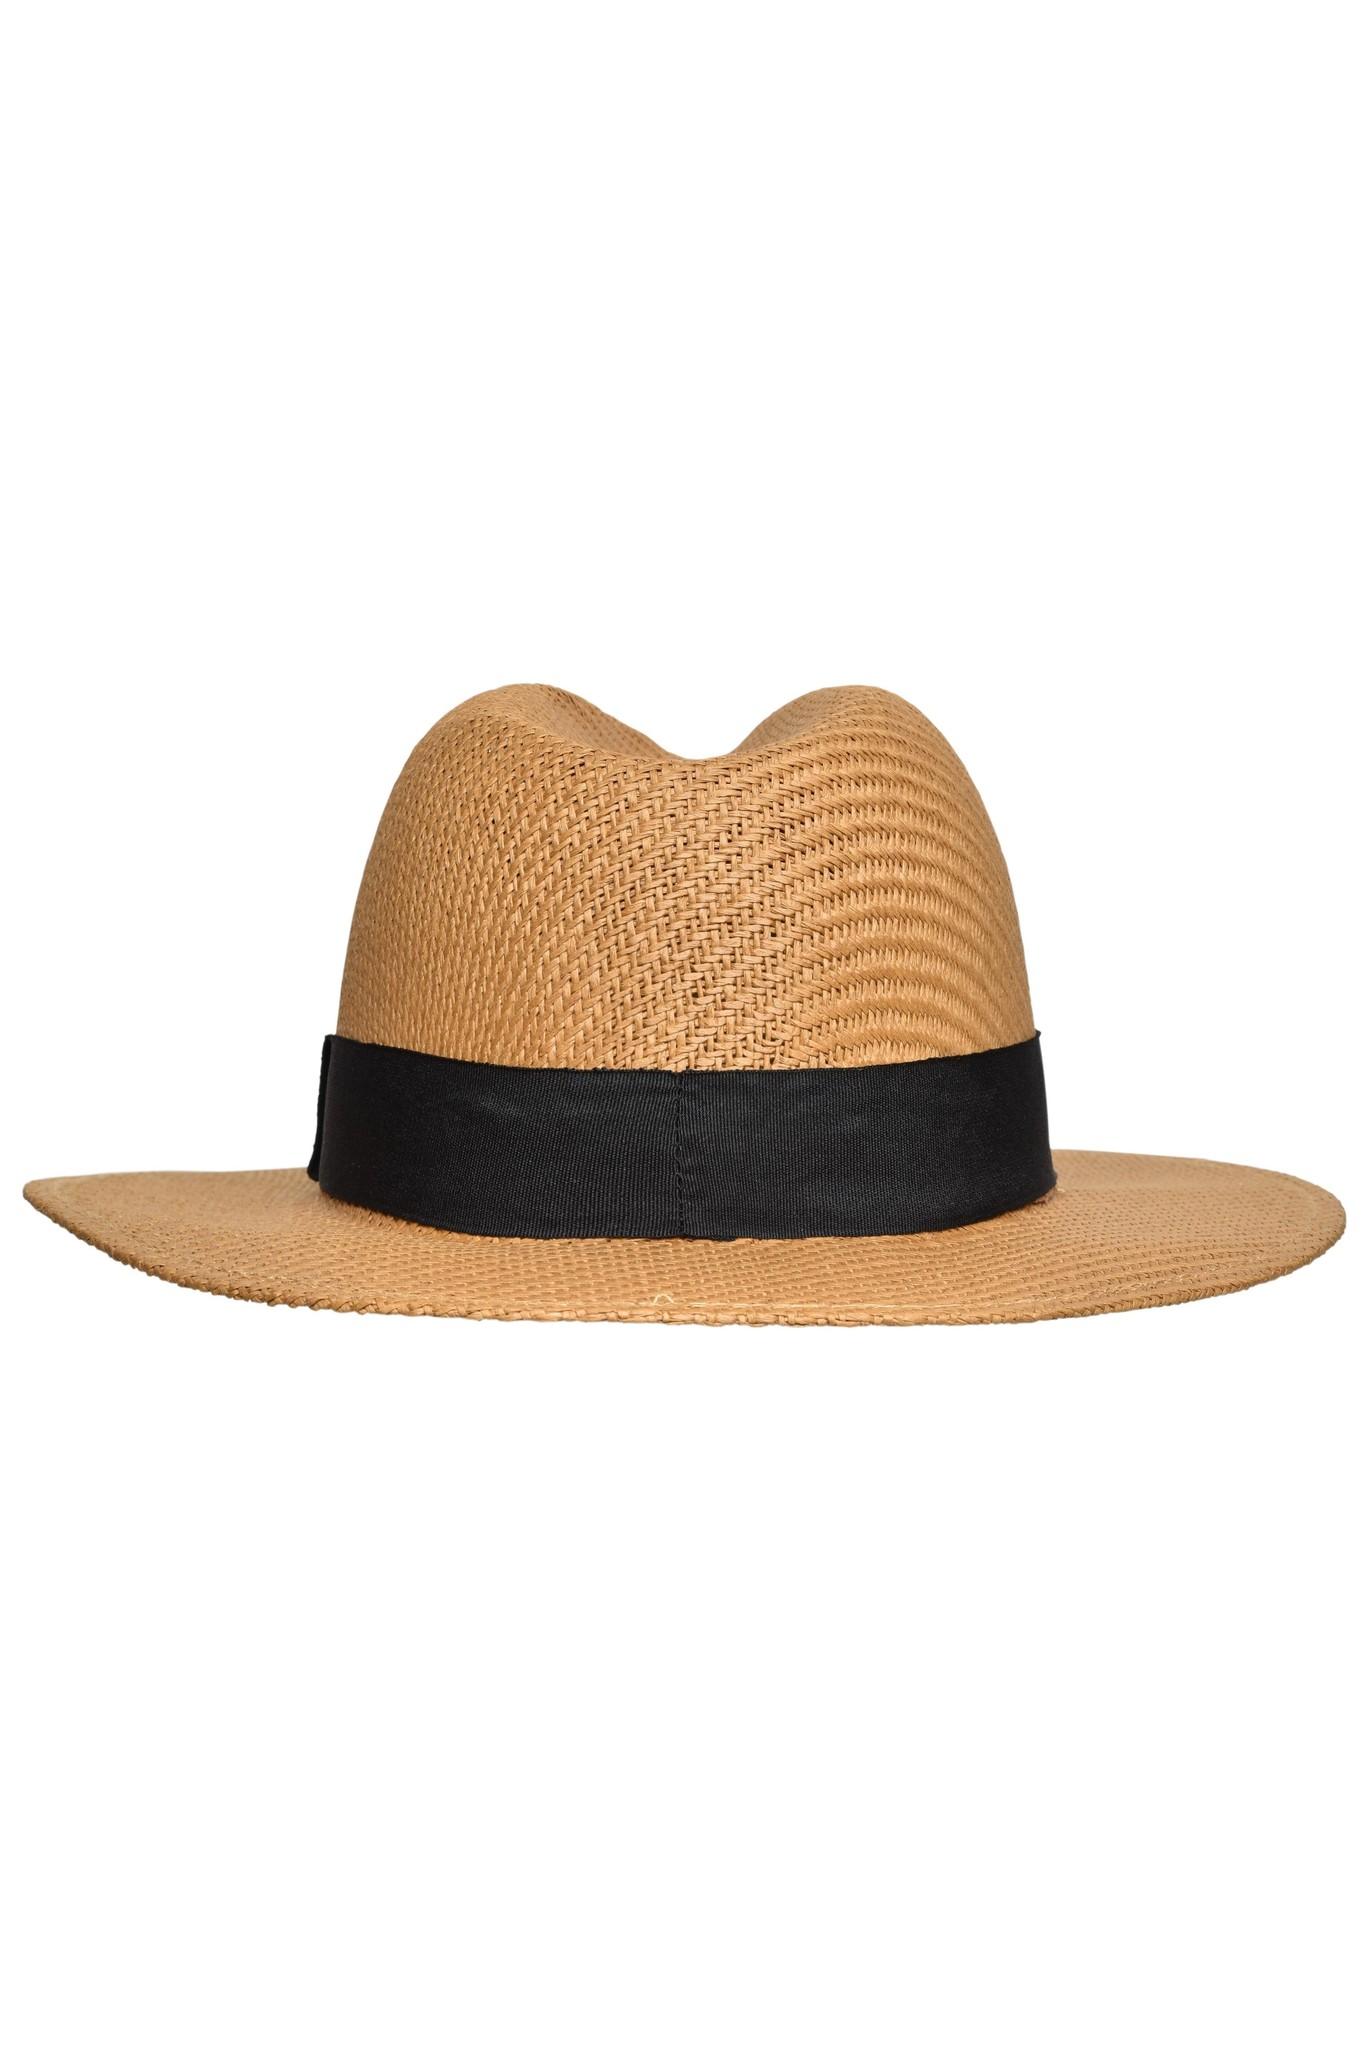 James Nicholson MB6599 cabl Trendstarker Hut in aufwendiger Flechtoptik - Copy